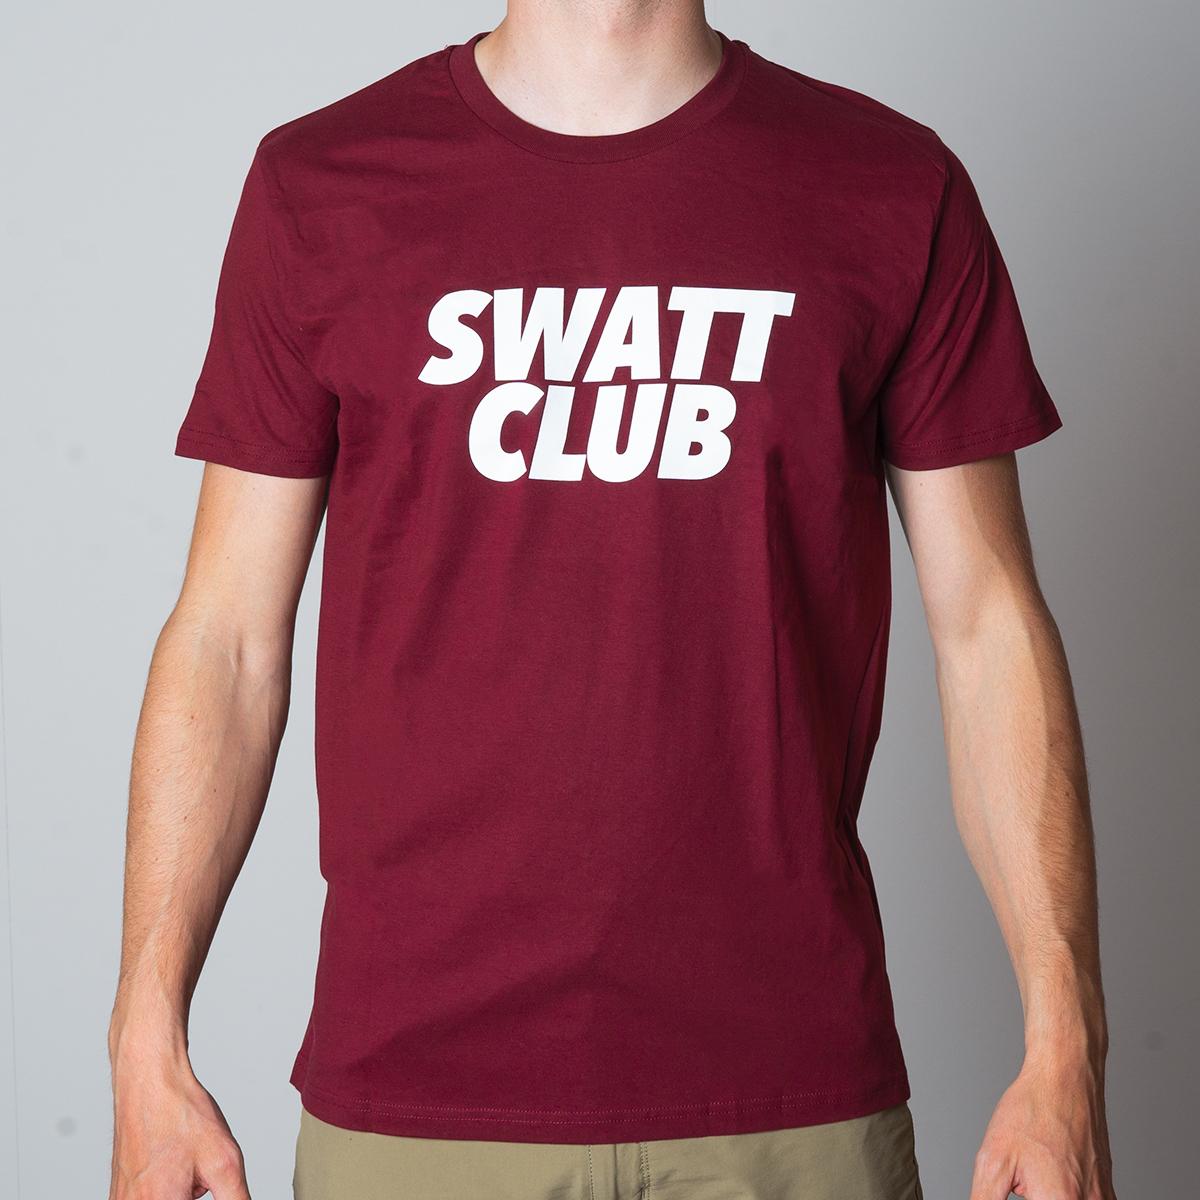 Burgundy t-shirt Swatt Club